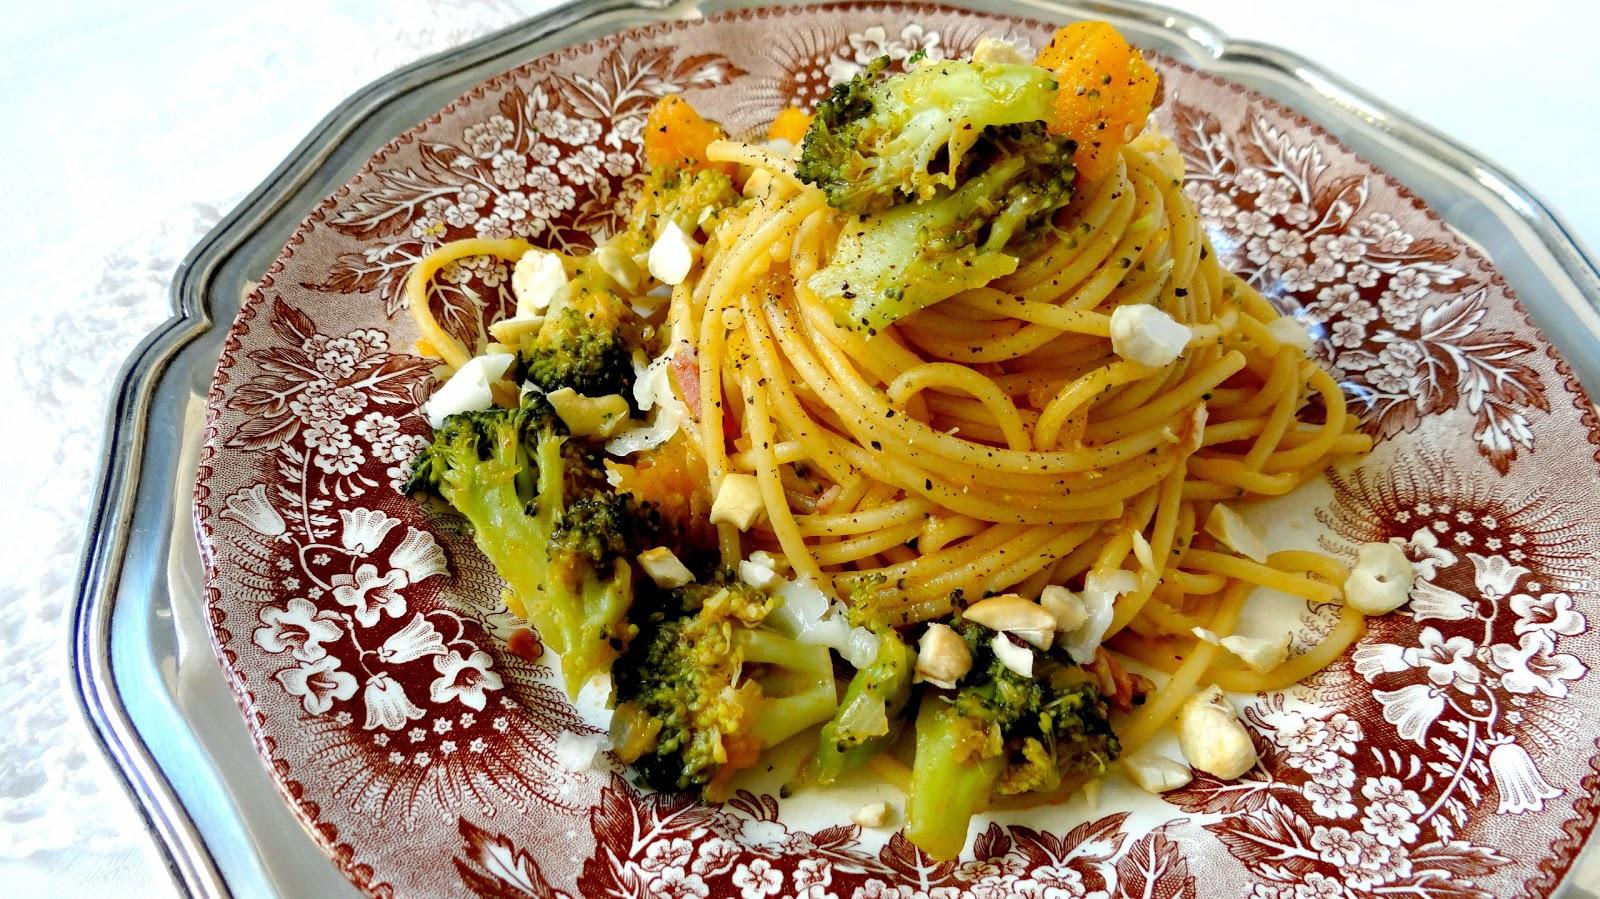 Autunno, zucca, broccoli, ragù